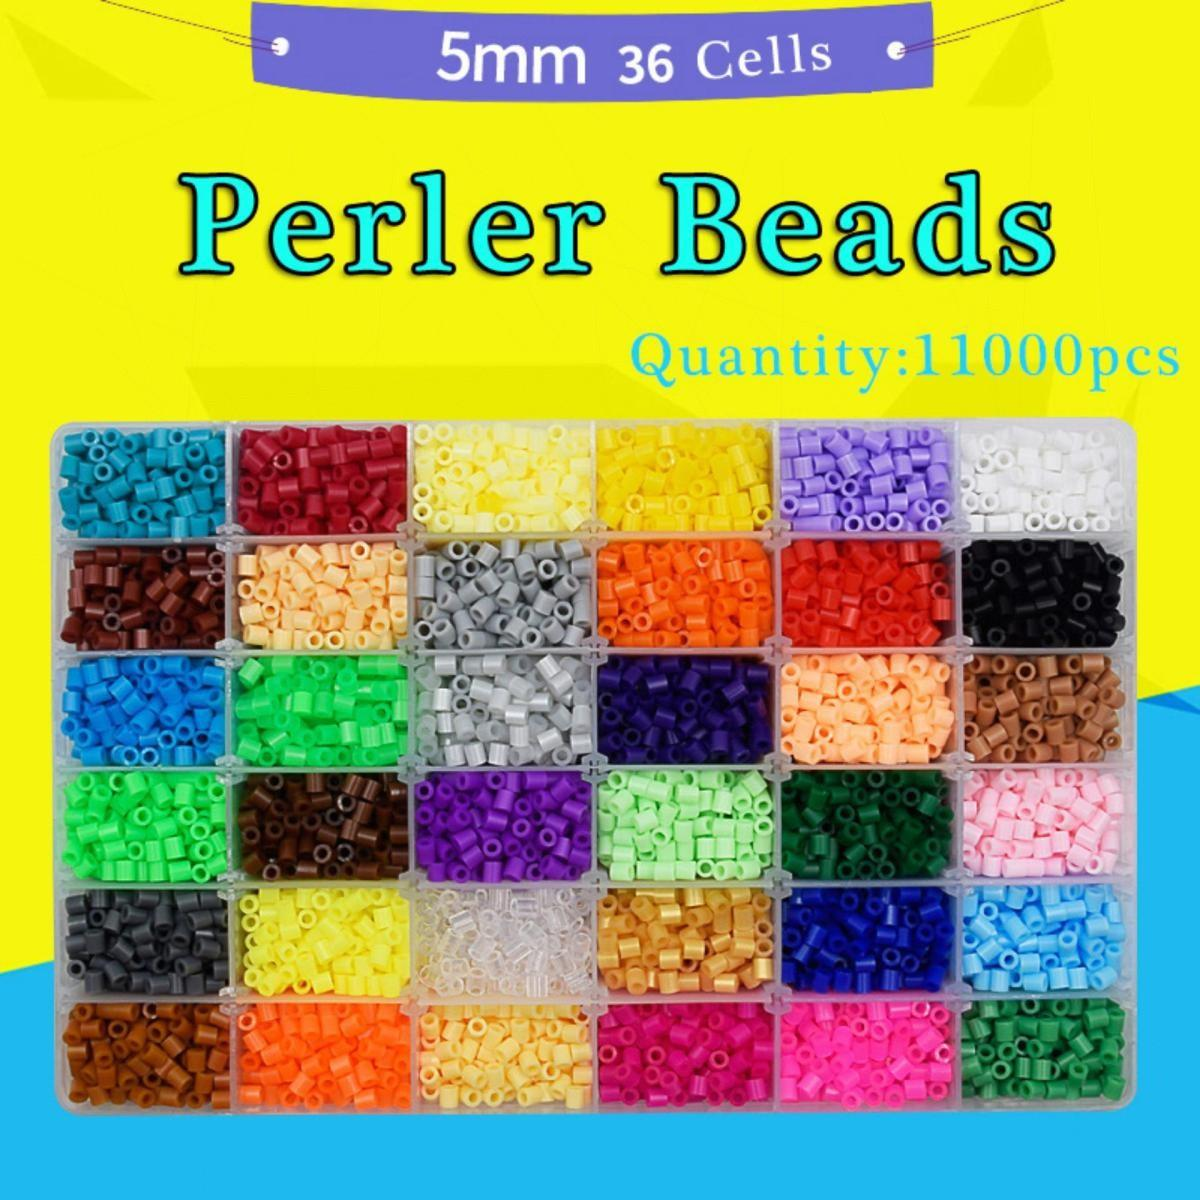 Perler Beads Fuse Beads Hama Kids Beads Kit 11000 Pcs 36 Colors Craft Beads For Children By Tcgbhvkog.